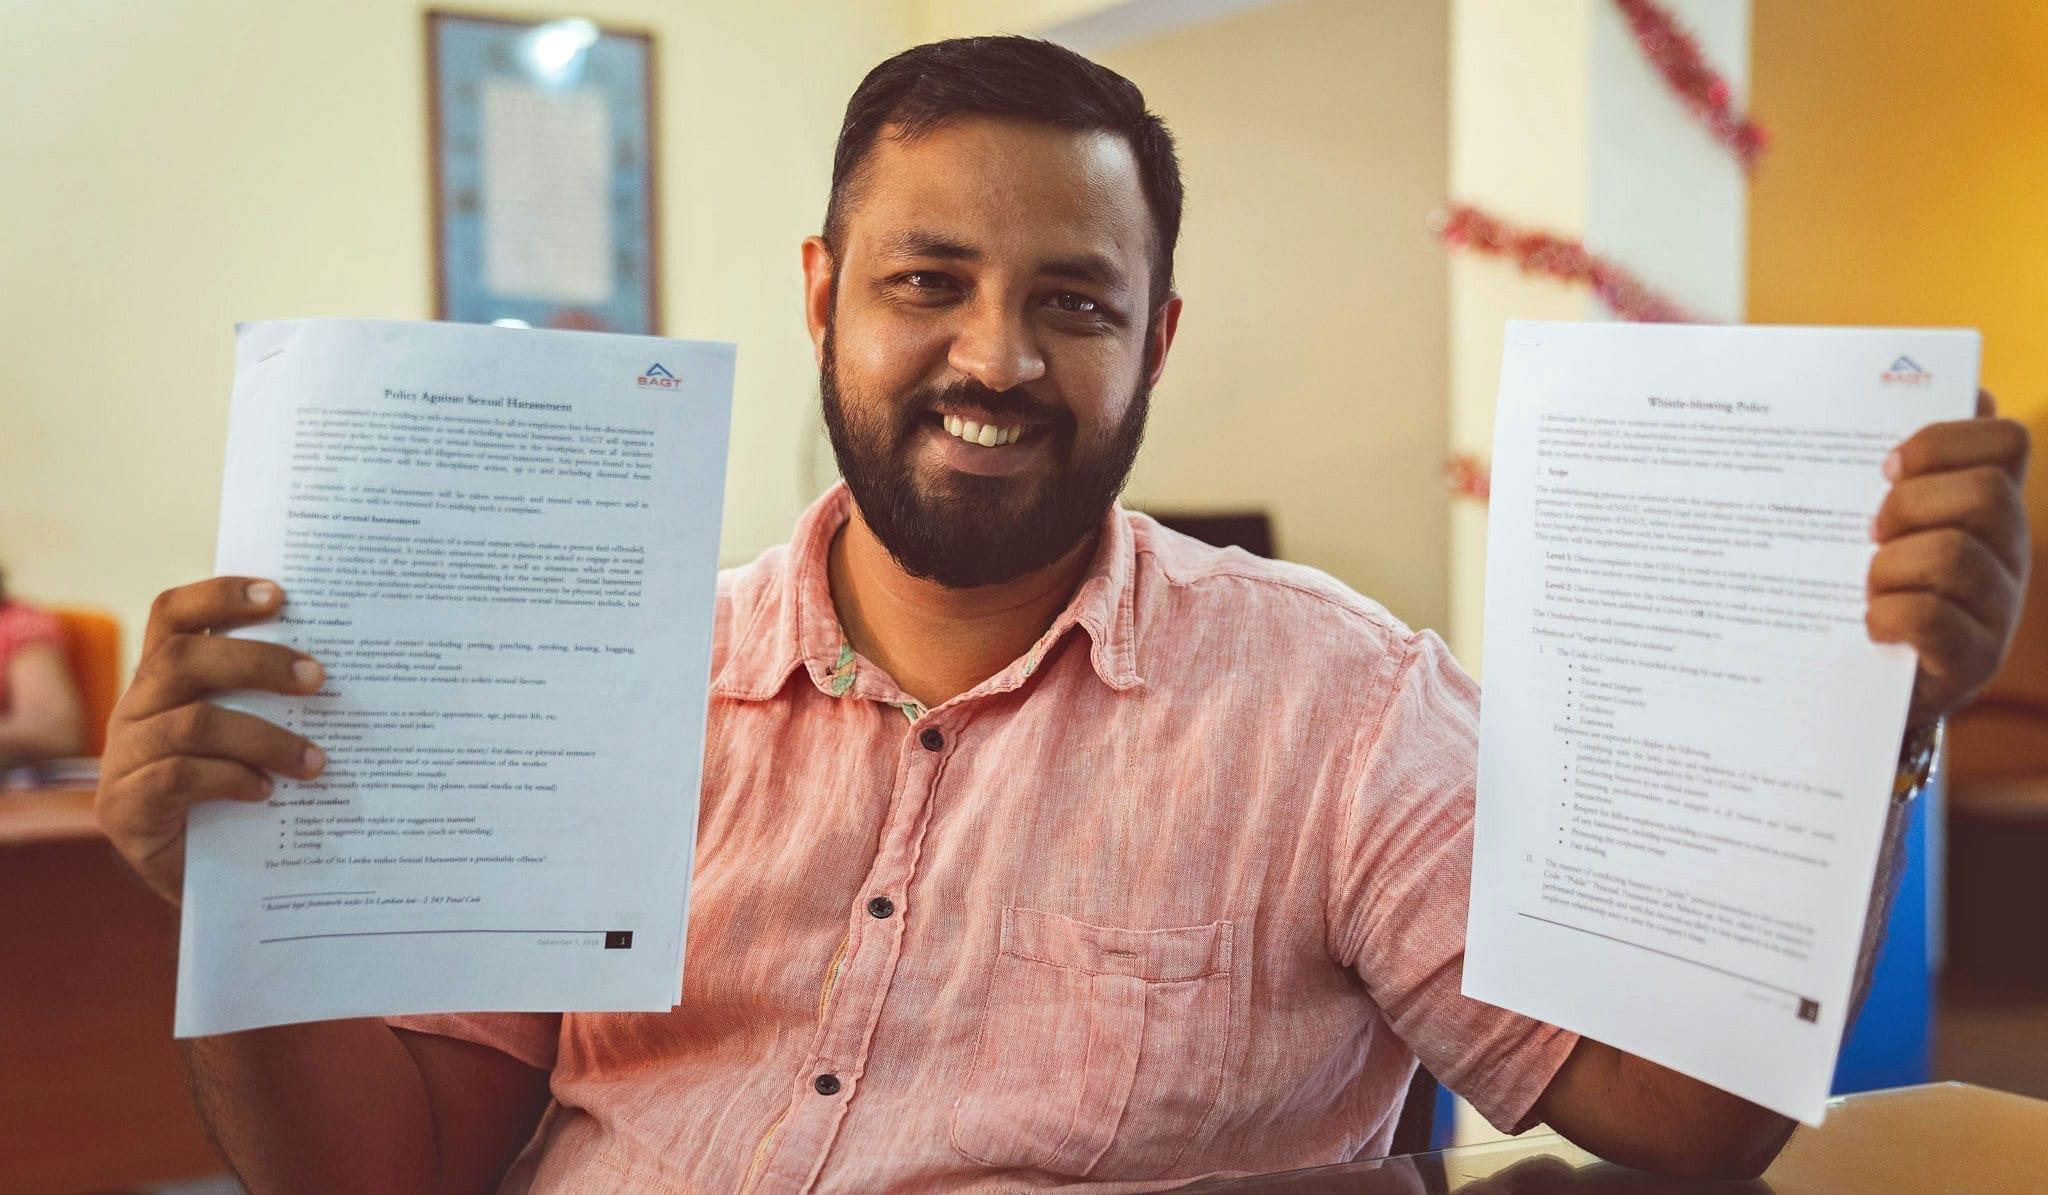 Sri Lanka, gender-based violence at work policy, worker rights, Solidarity Center